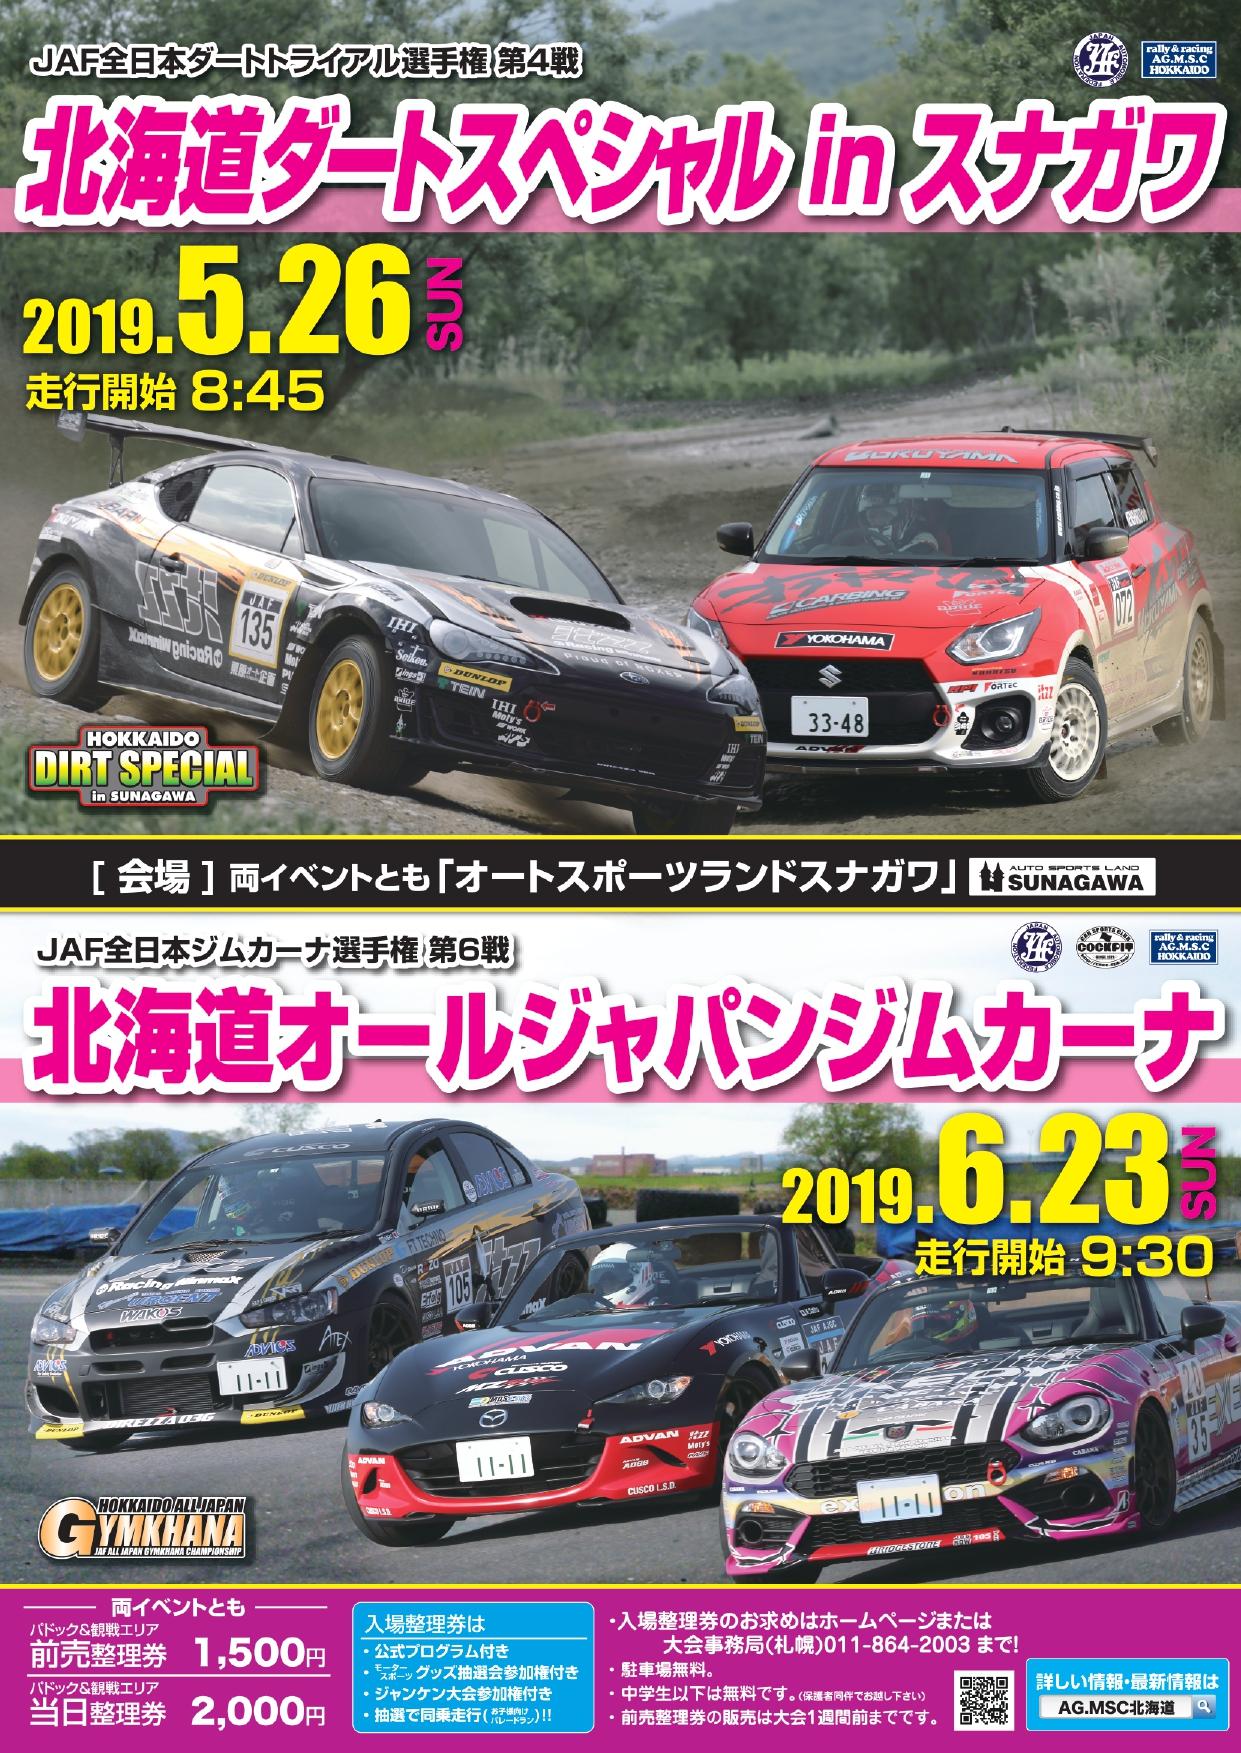 JAF全日本ジムカーナ選手権第6戦北海道オールジャパンジムカーナ(2019年)のポスター